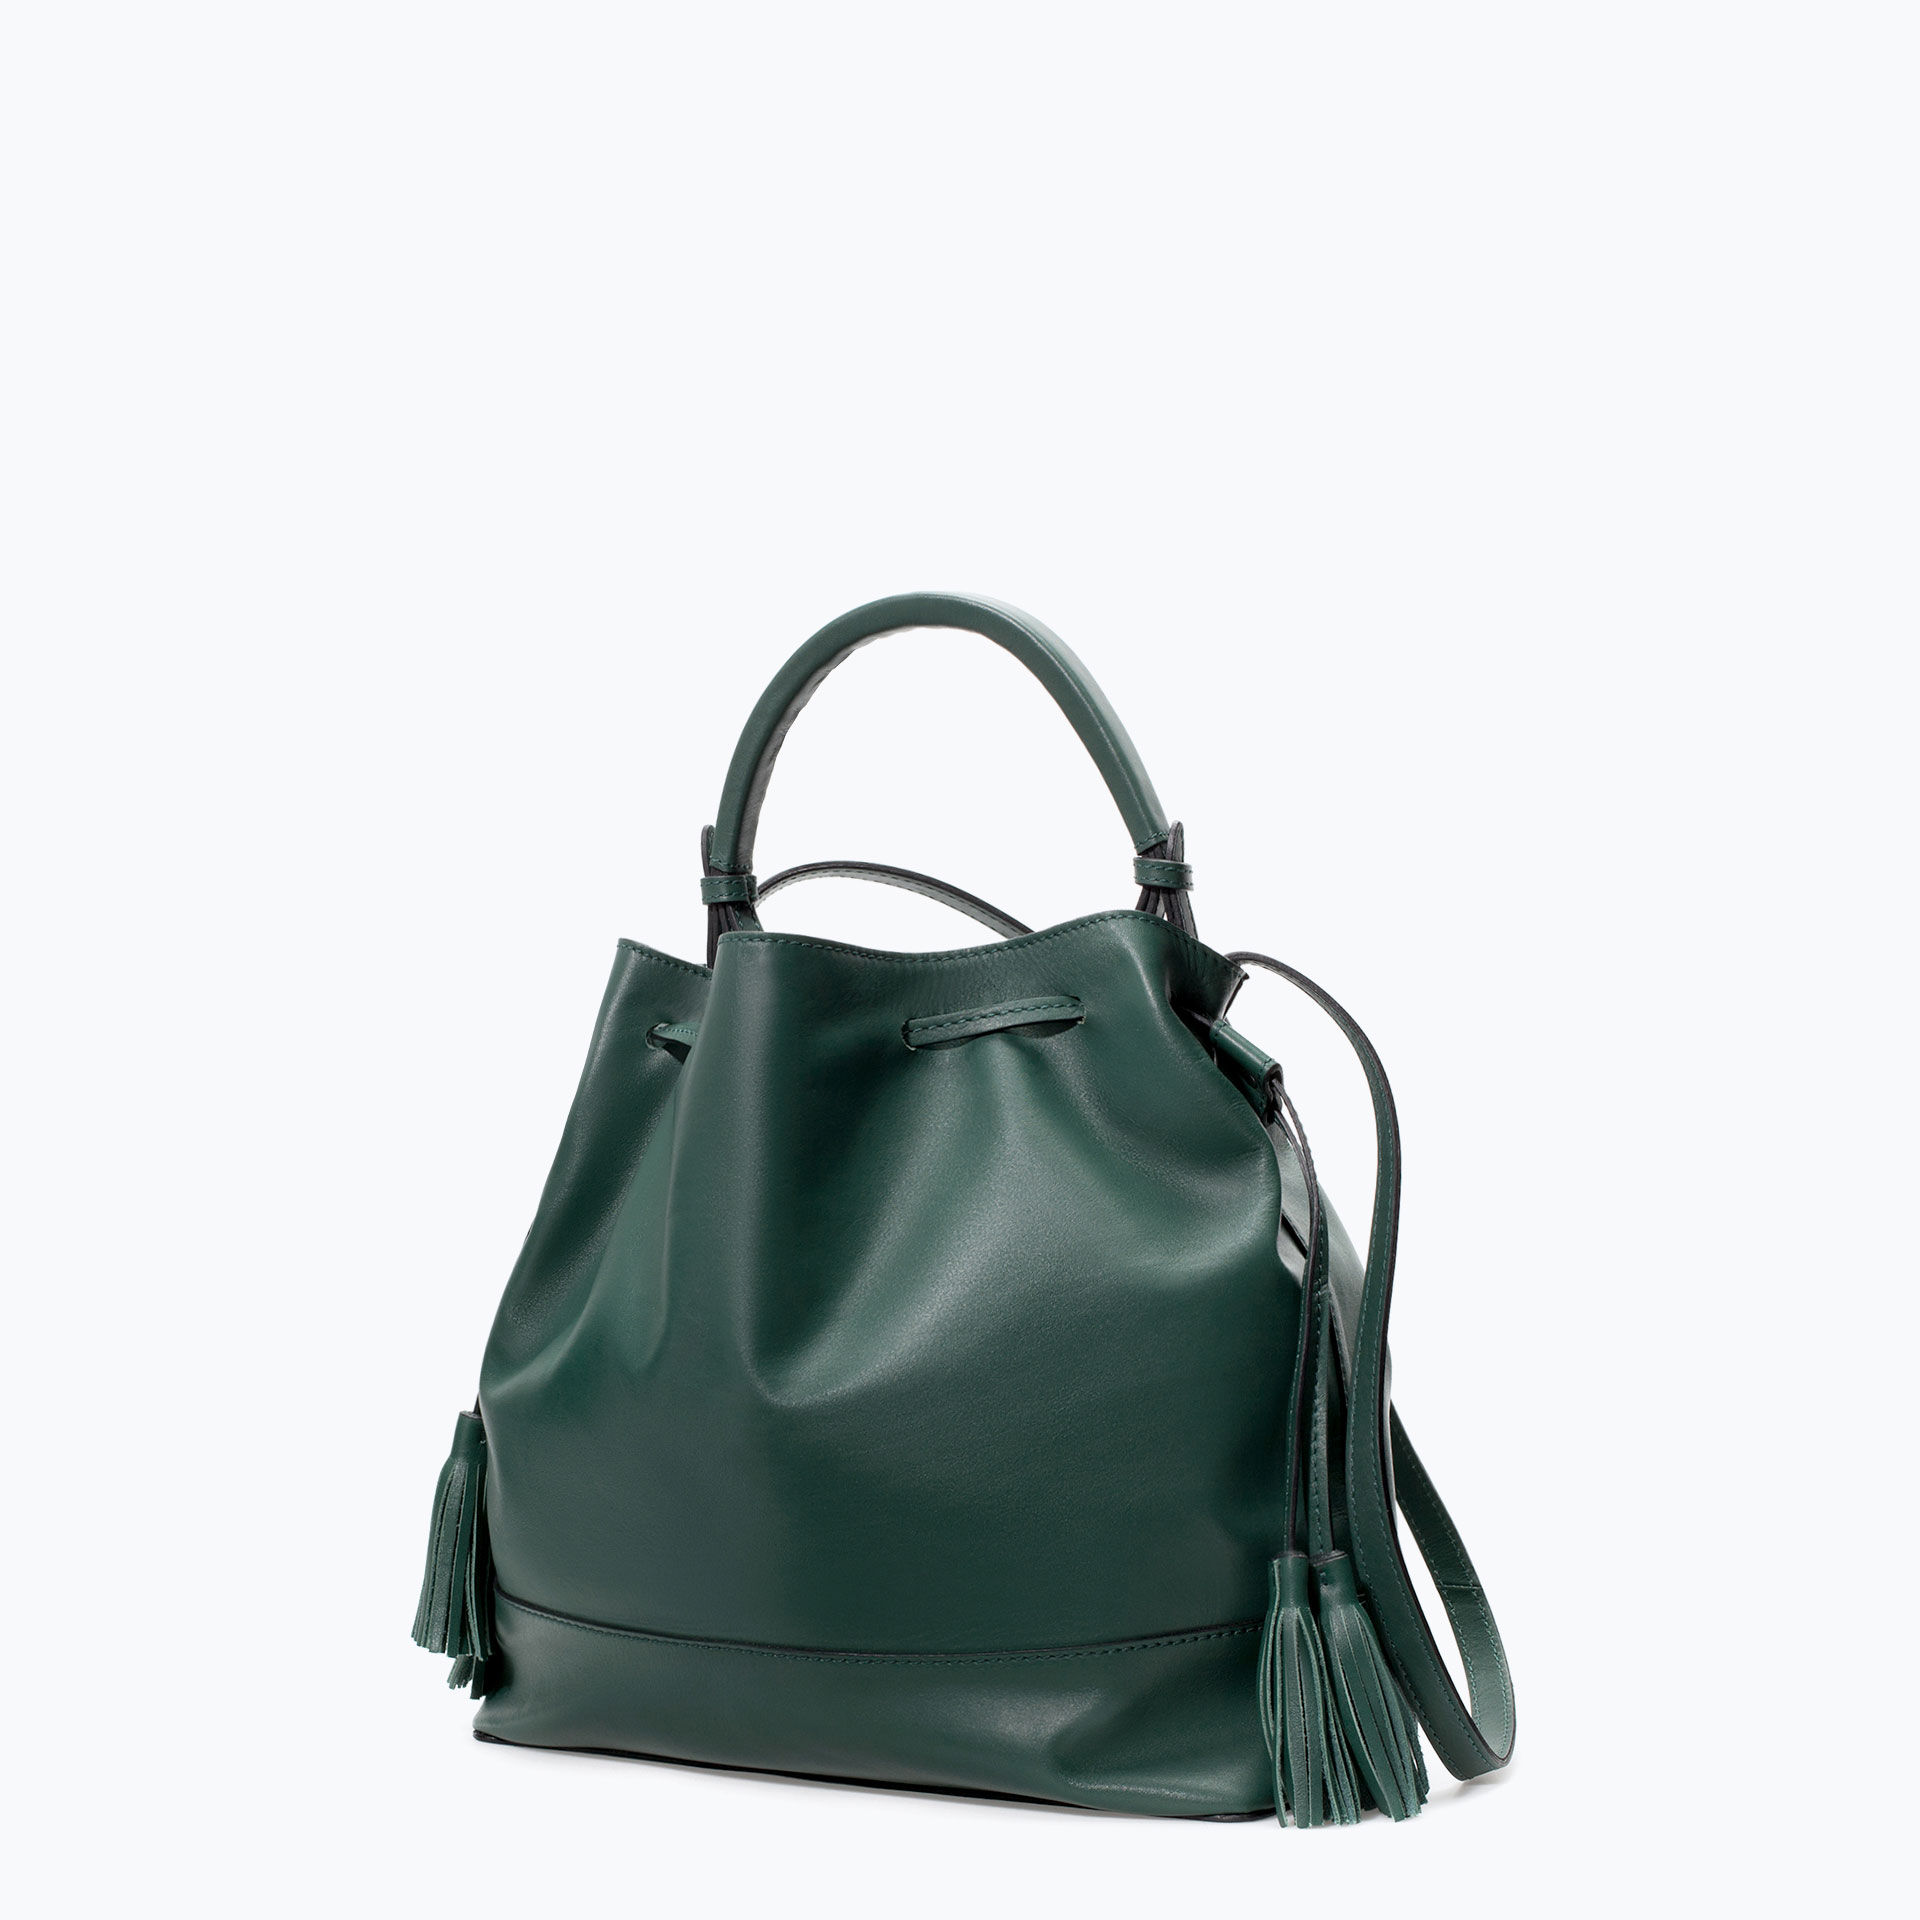 BAG WITH RIGID HANDLE Handbags WOMAN ZARA Albania